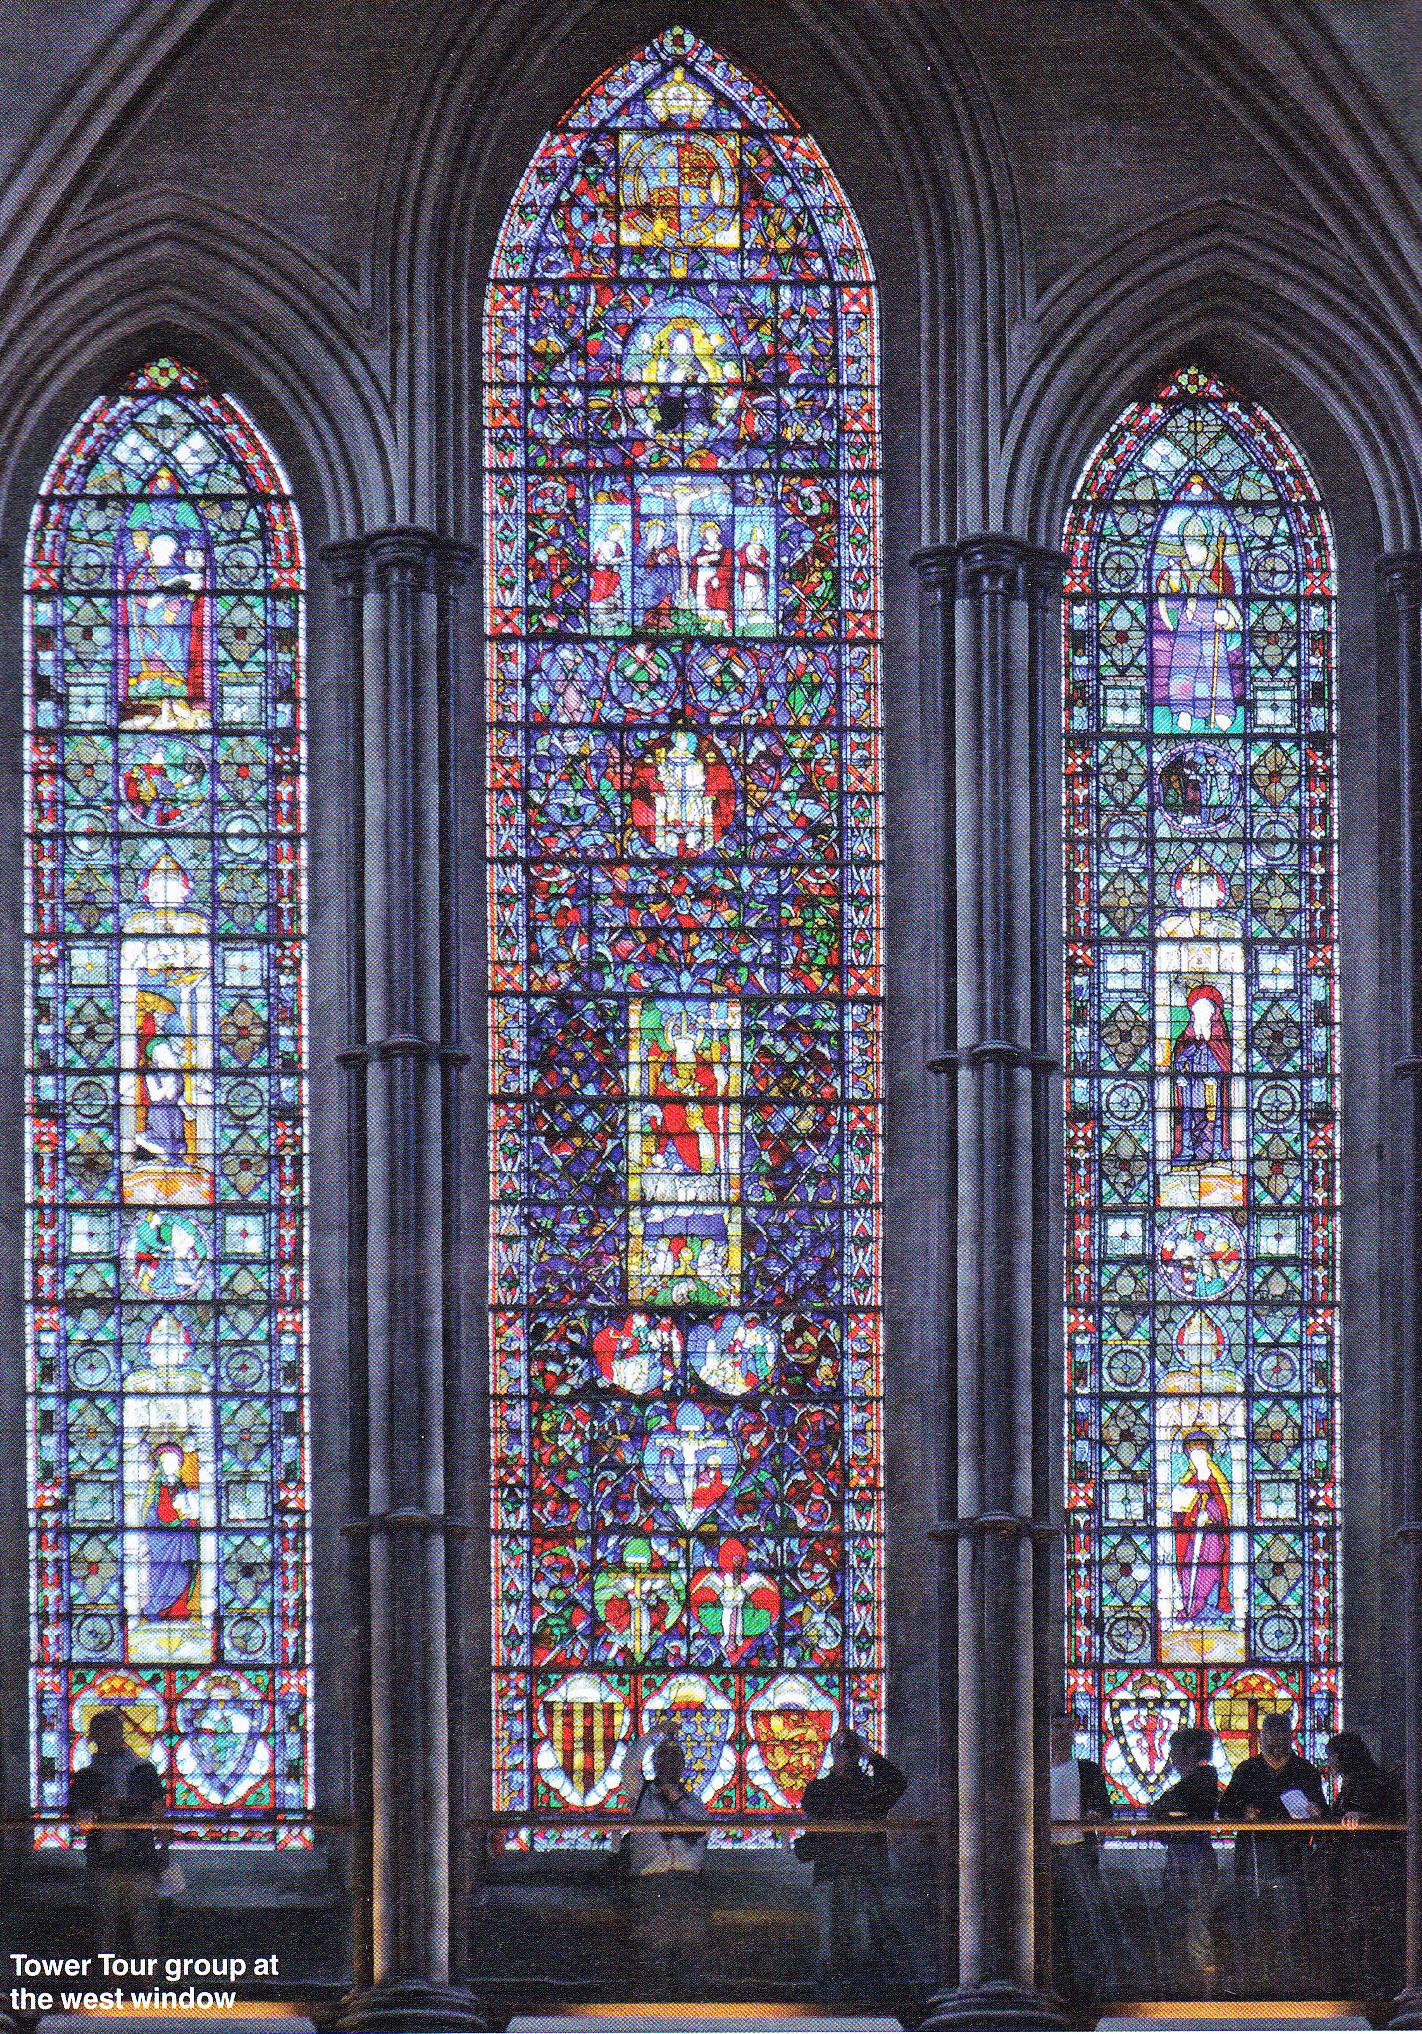 https://www.antiblavers.org/galeria/albums/userpics/10223/Vitrall_Catedral_Salisbury.jpg